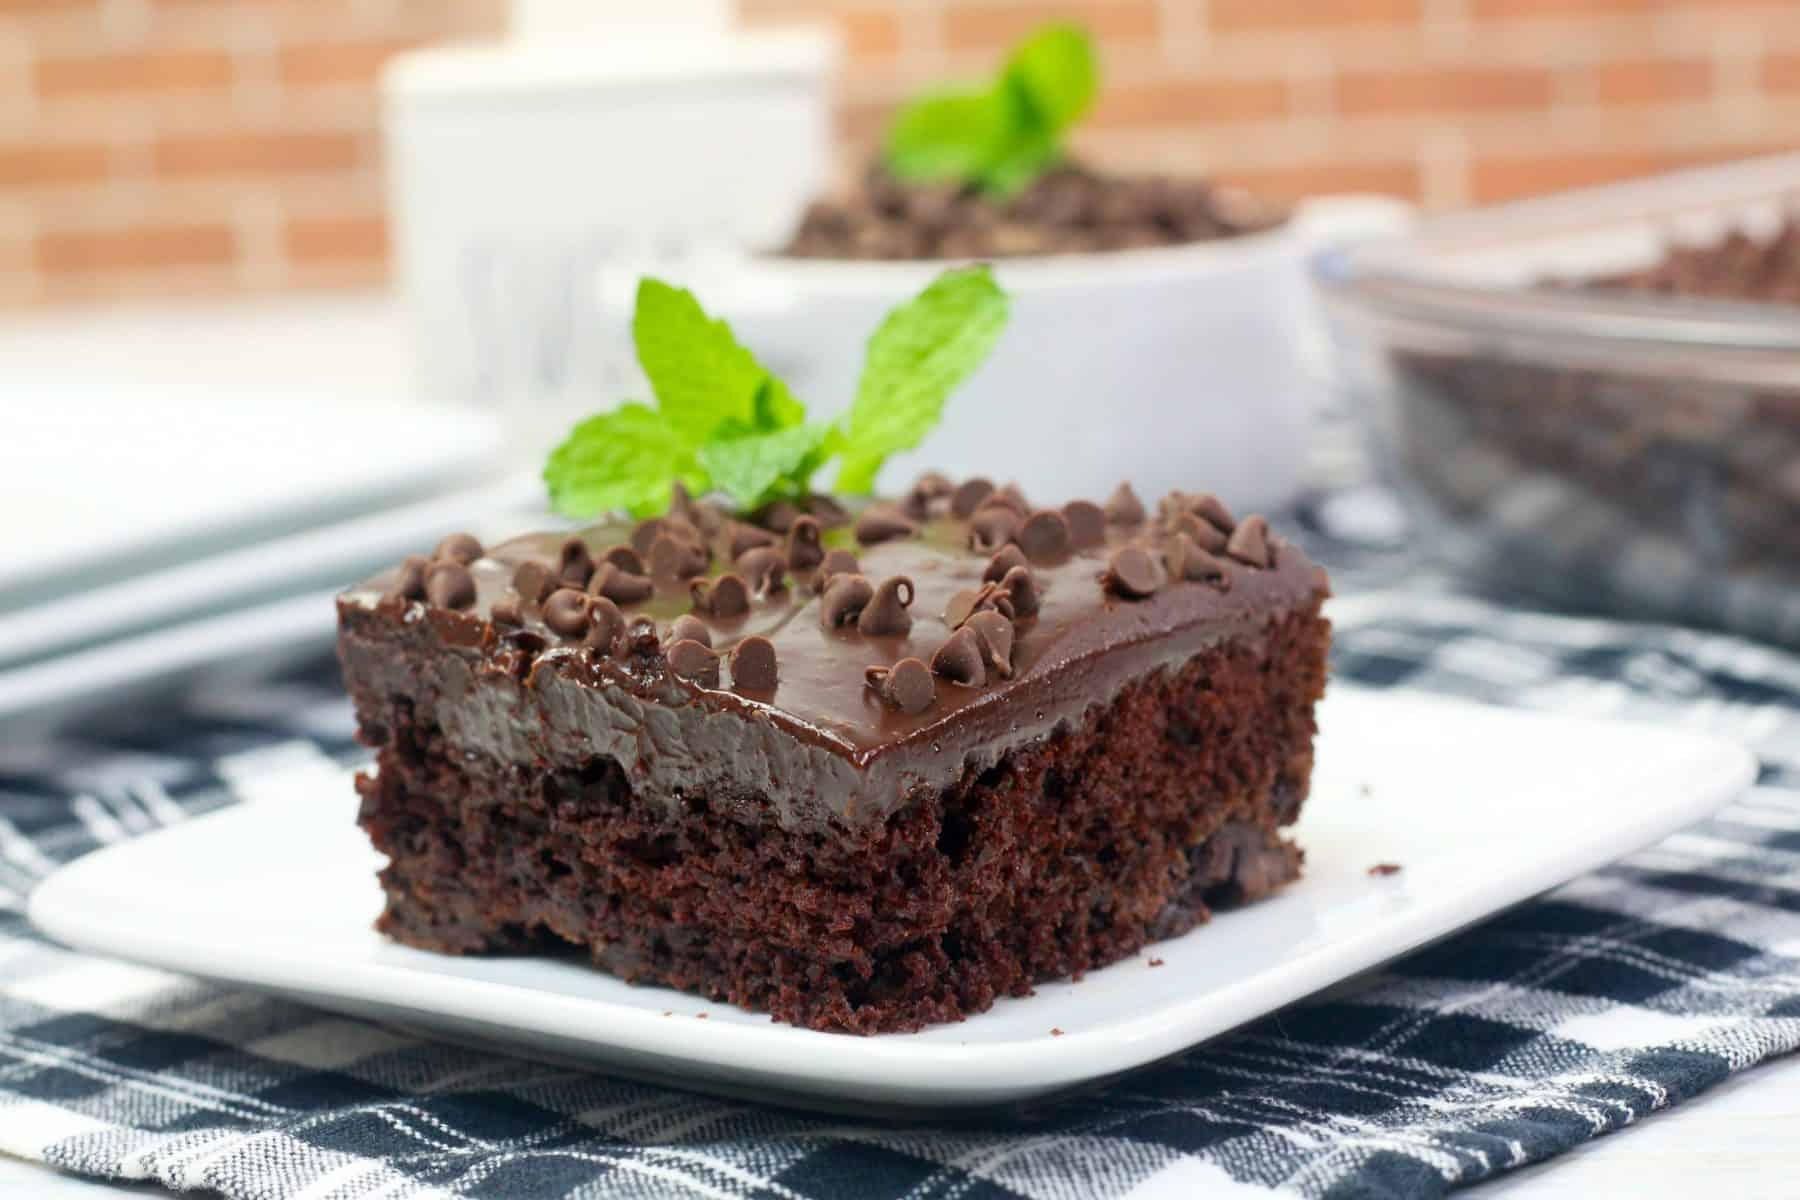 Mint Texas Trash Cake Recipe, Chocolate Mint Cake